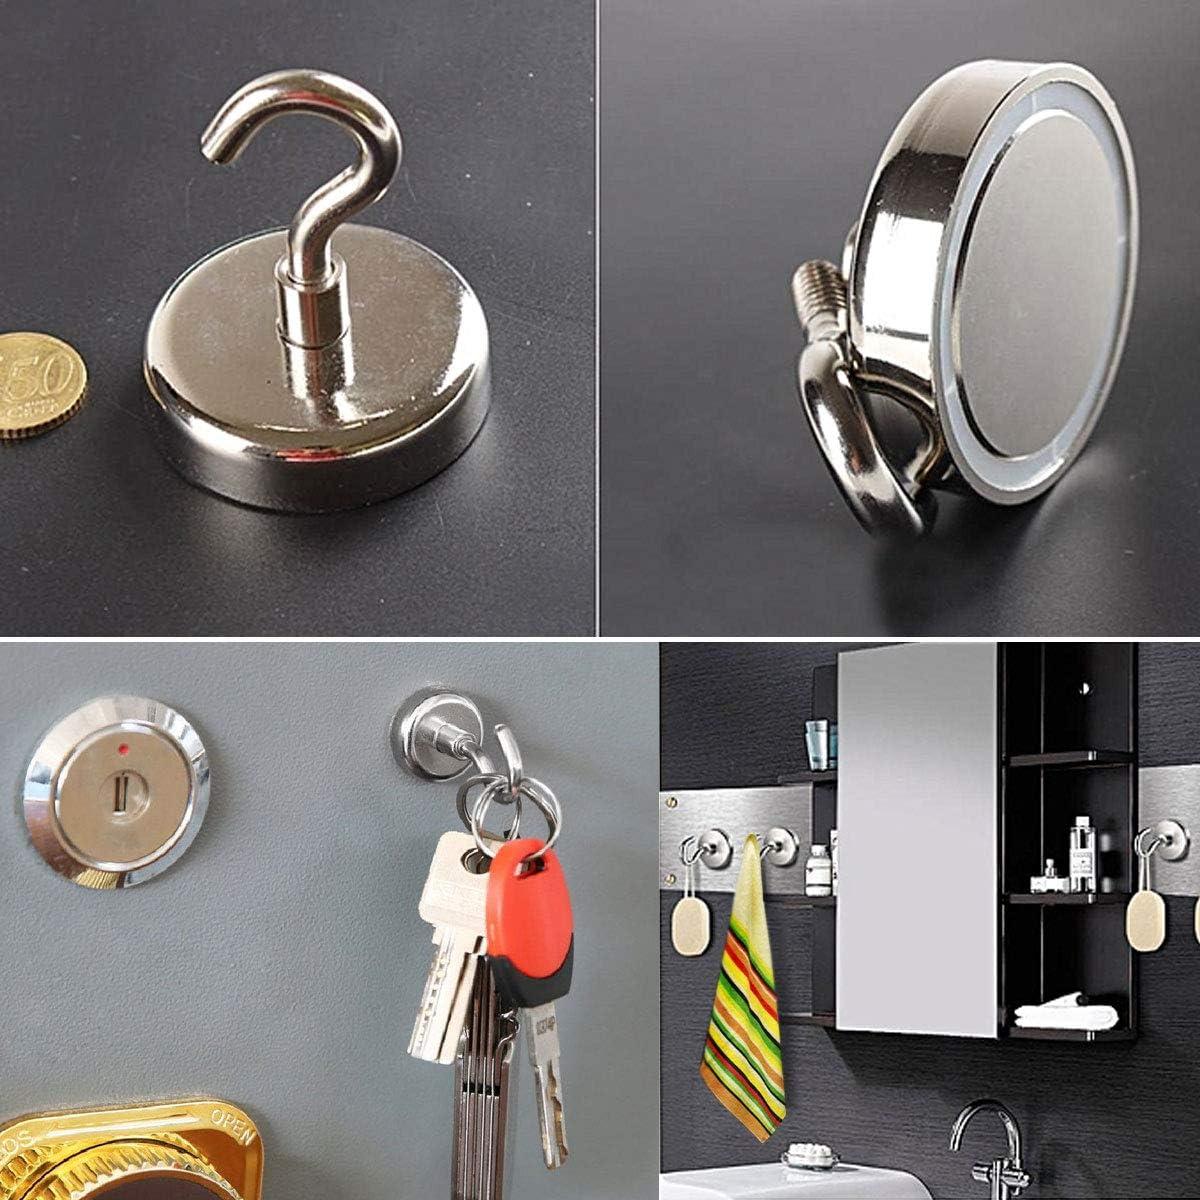 Magnetic Hook Neodymium Magnet Hook Two hooks-3pc-16 25 32mm 16mm 25mm 32mm Magnet Hook